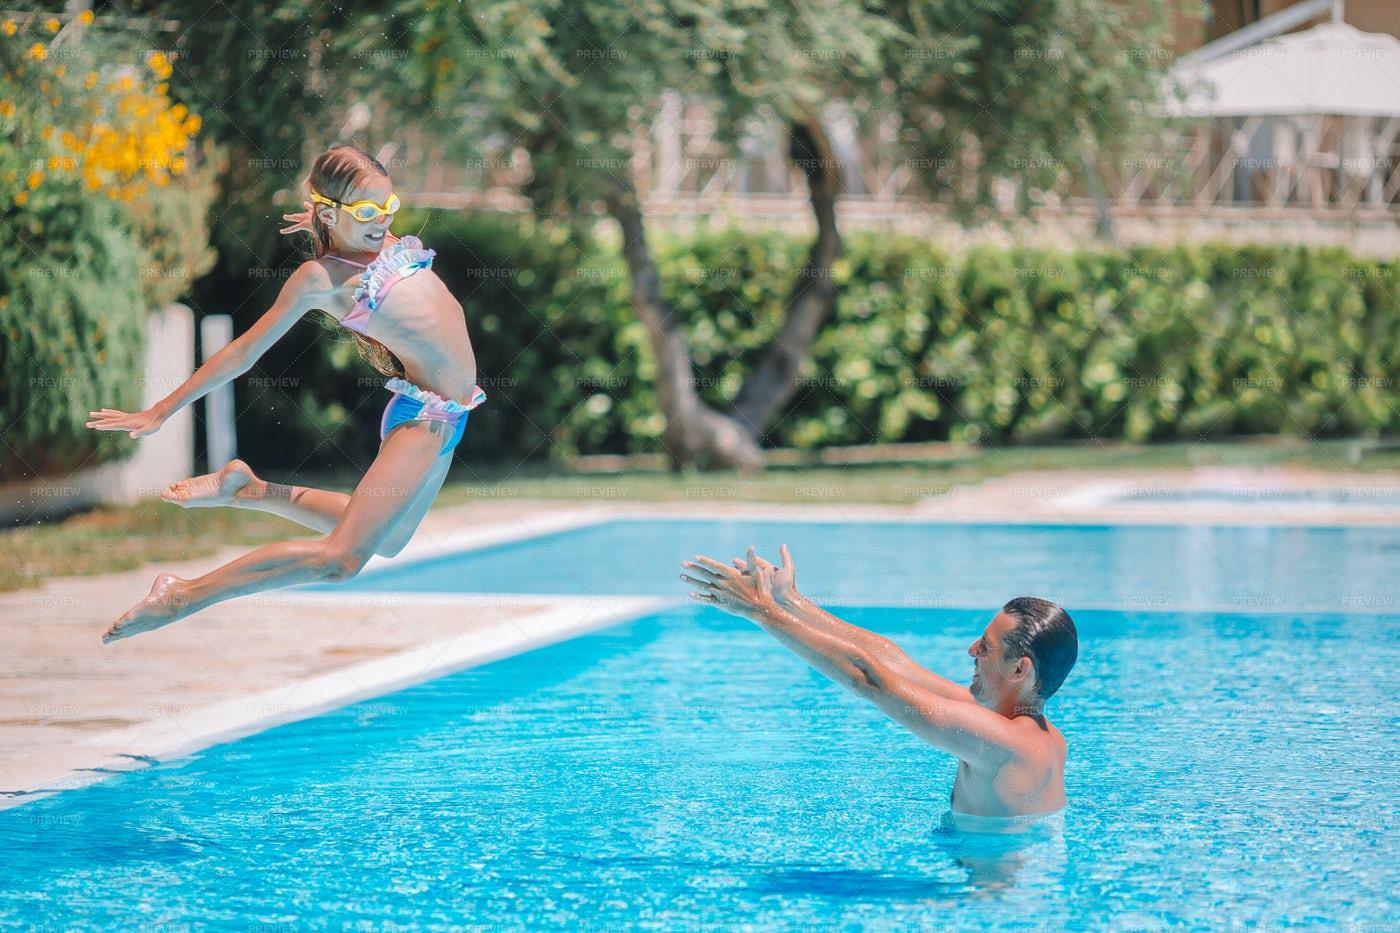 Girl Jumping Into A Pool: Stock Photos